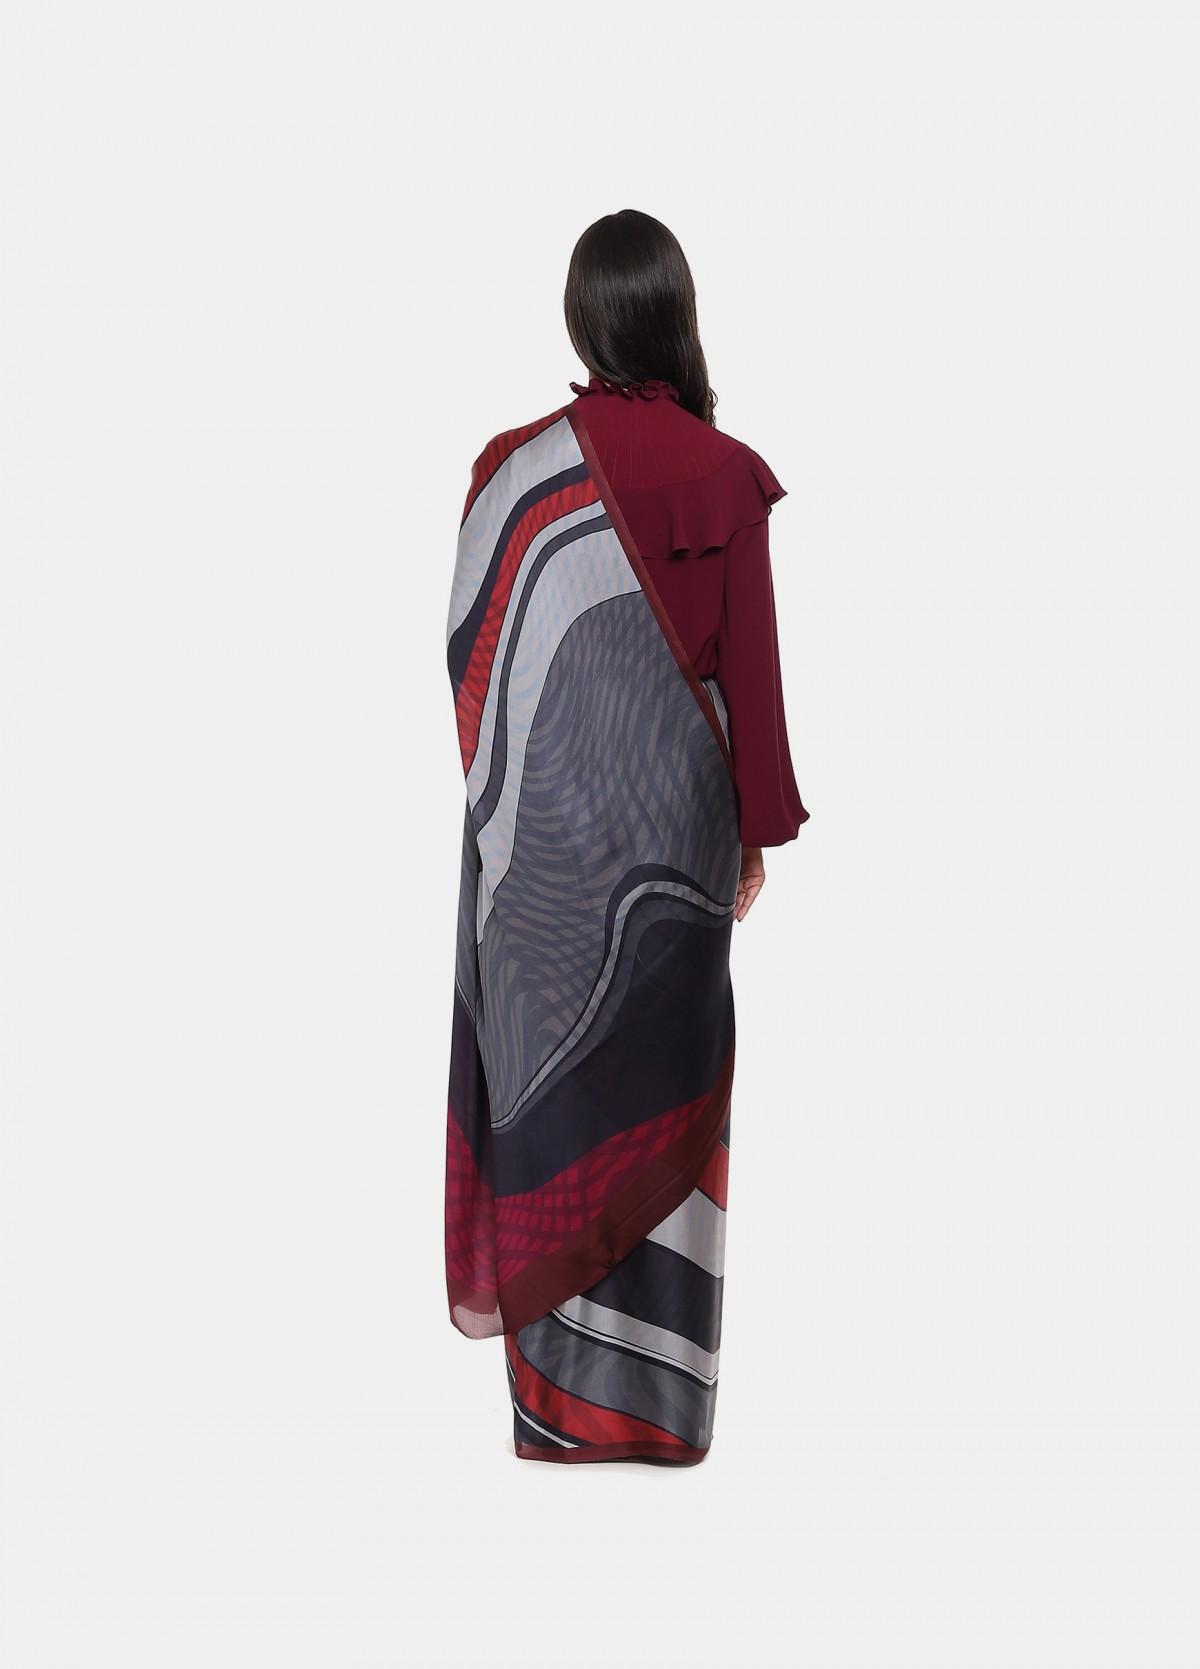 The Far Out Sari